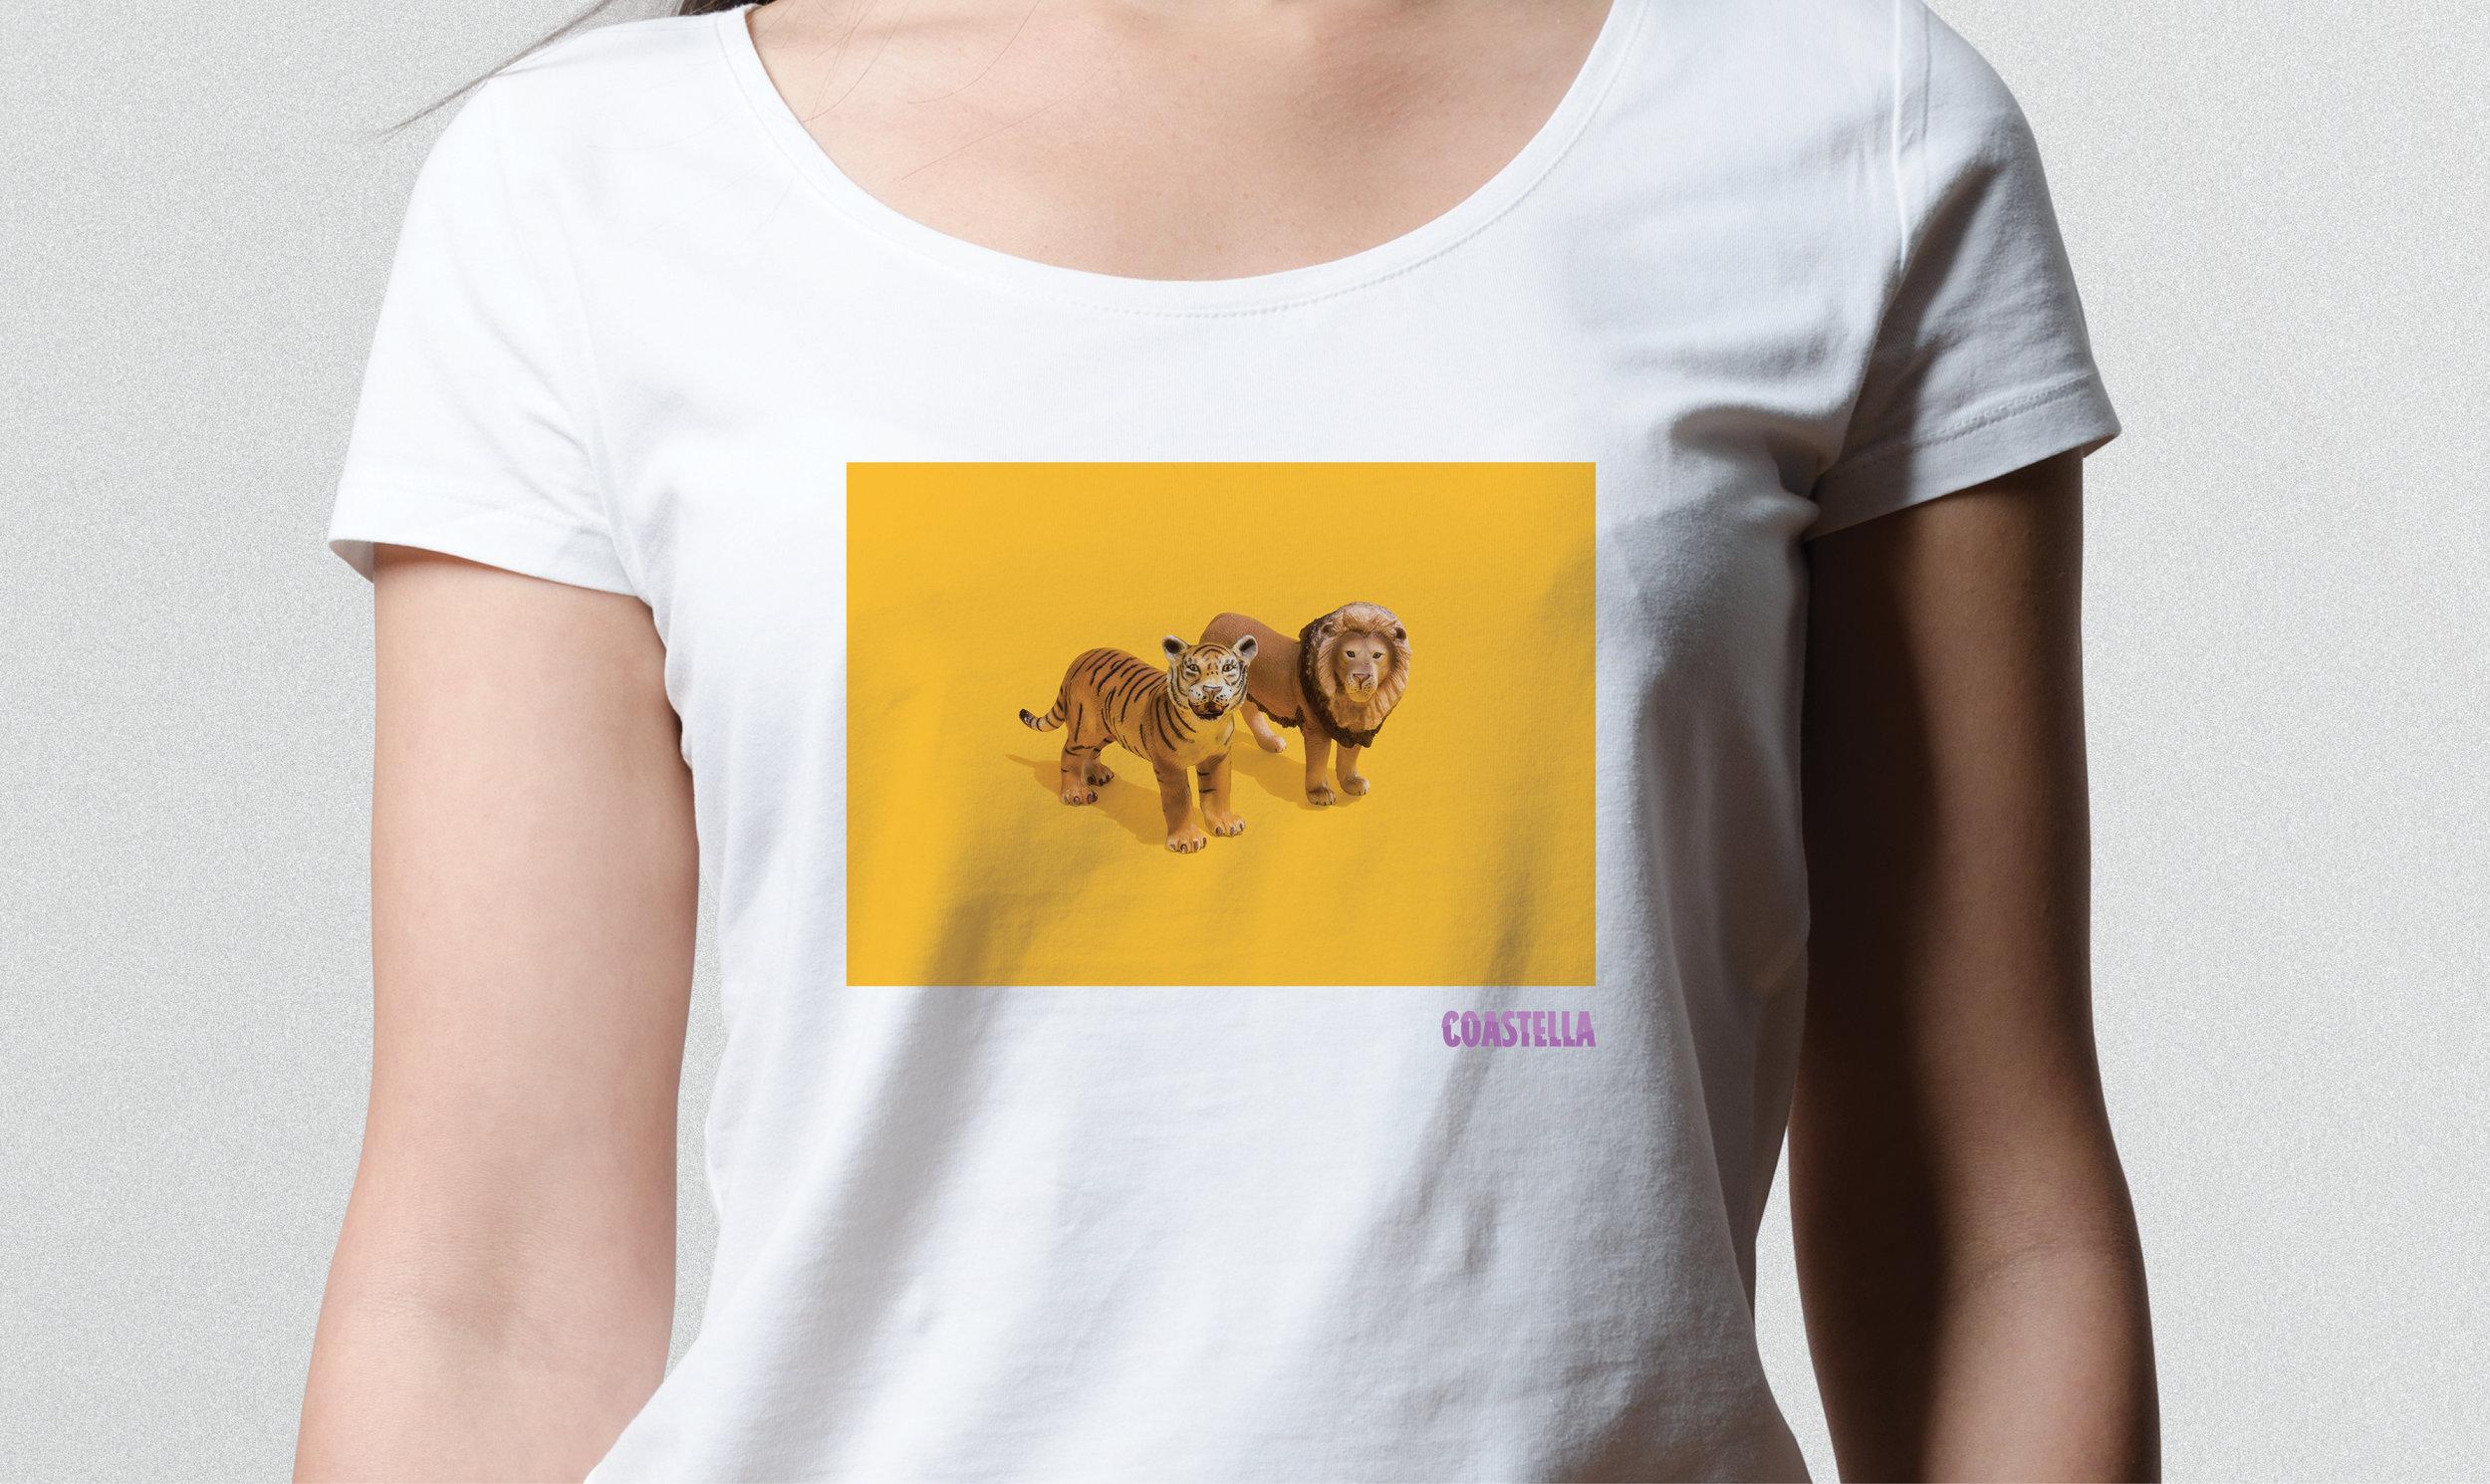 Coastella tee-shirt design.jpg